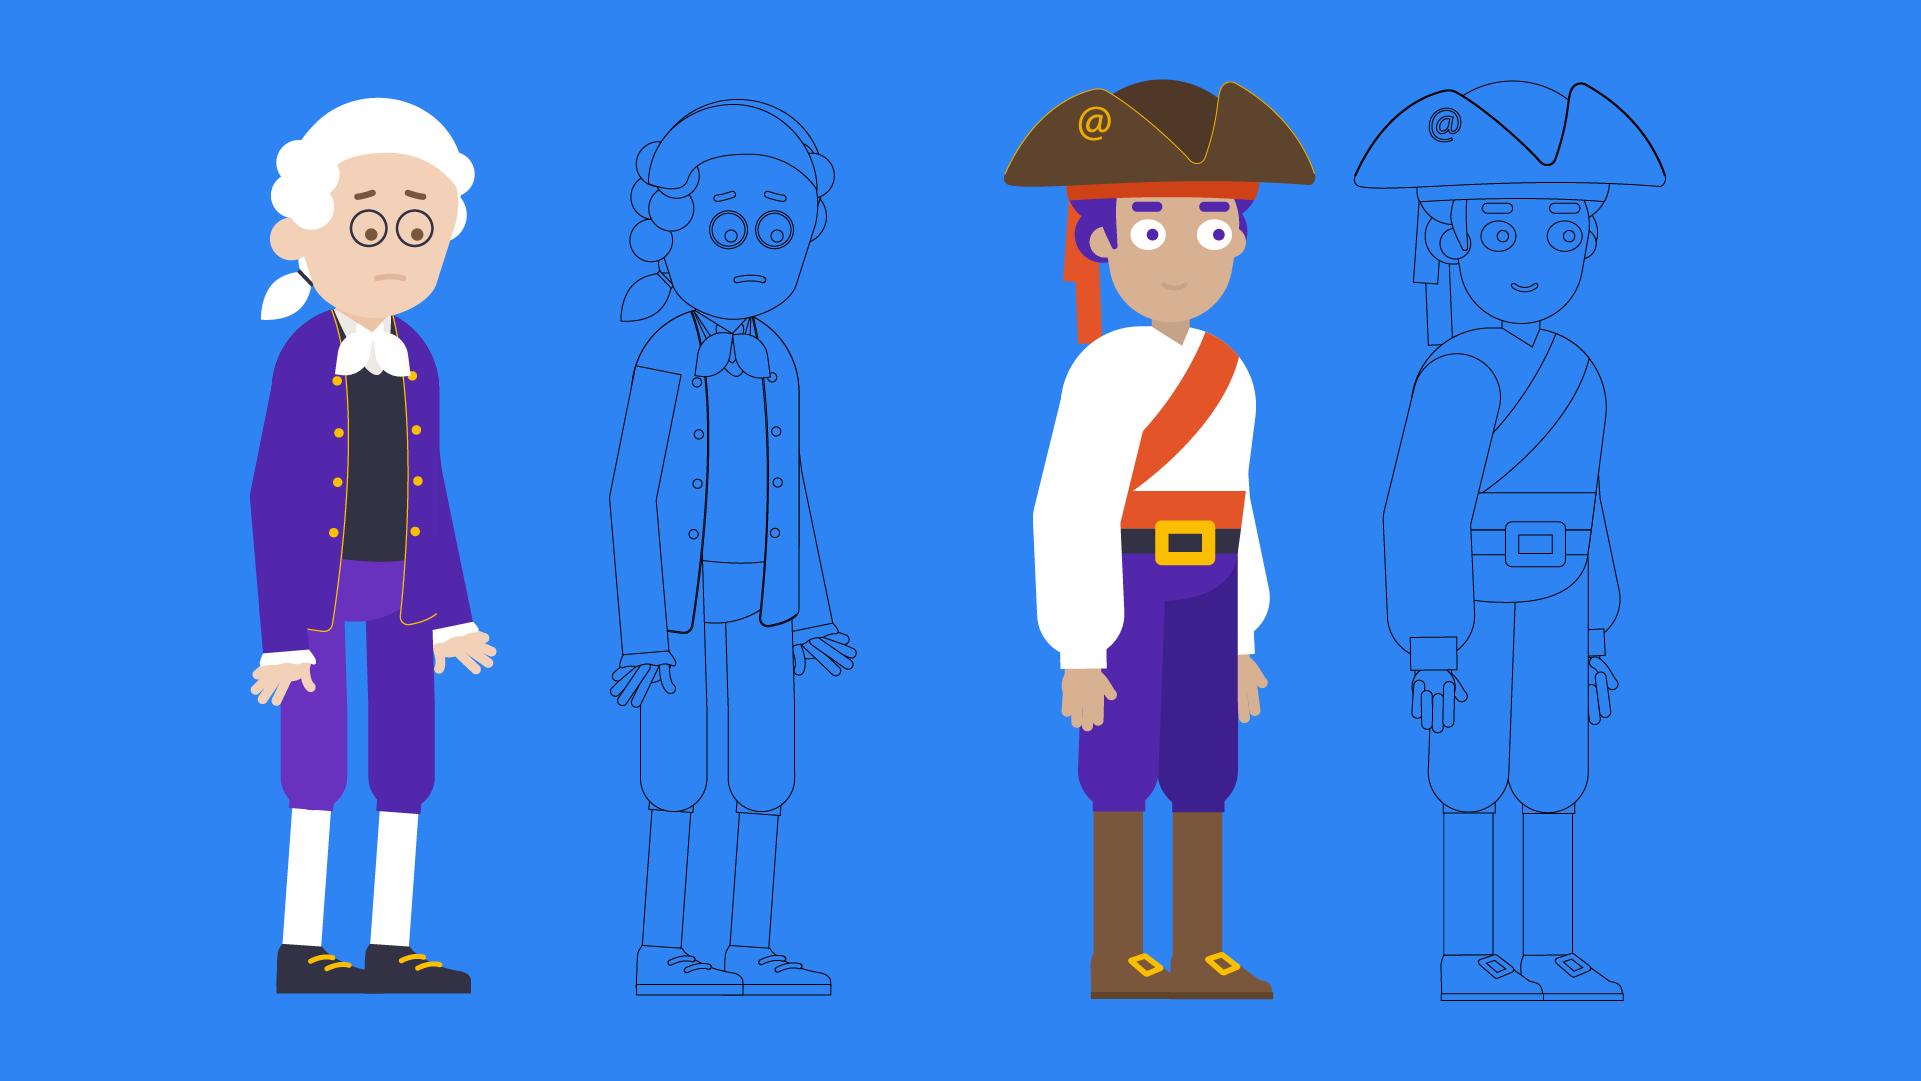 character_design-06